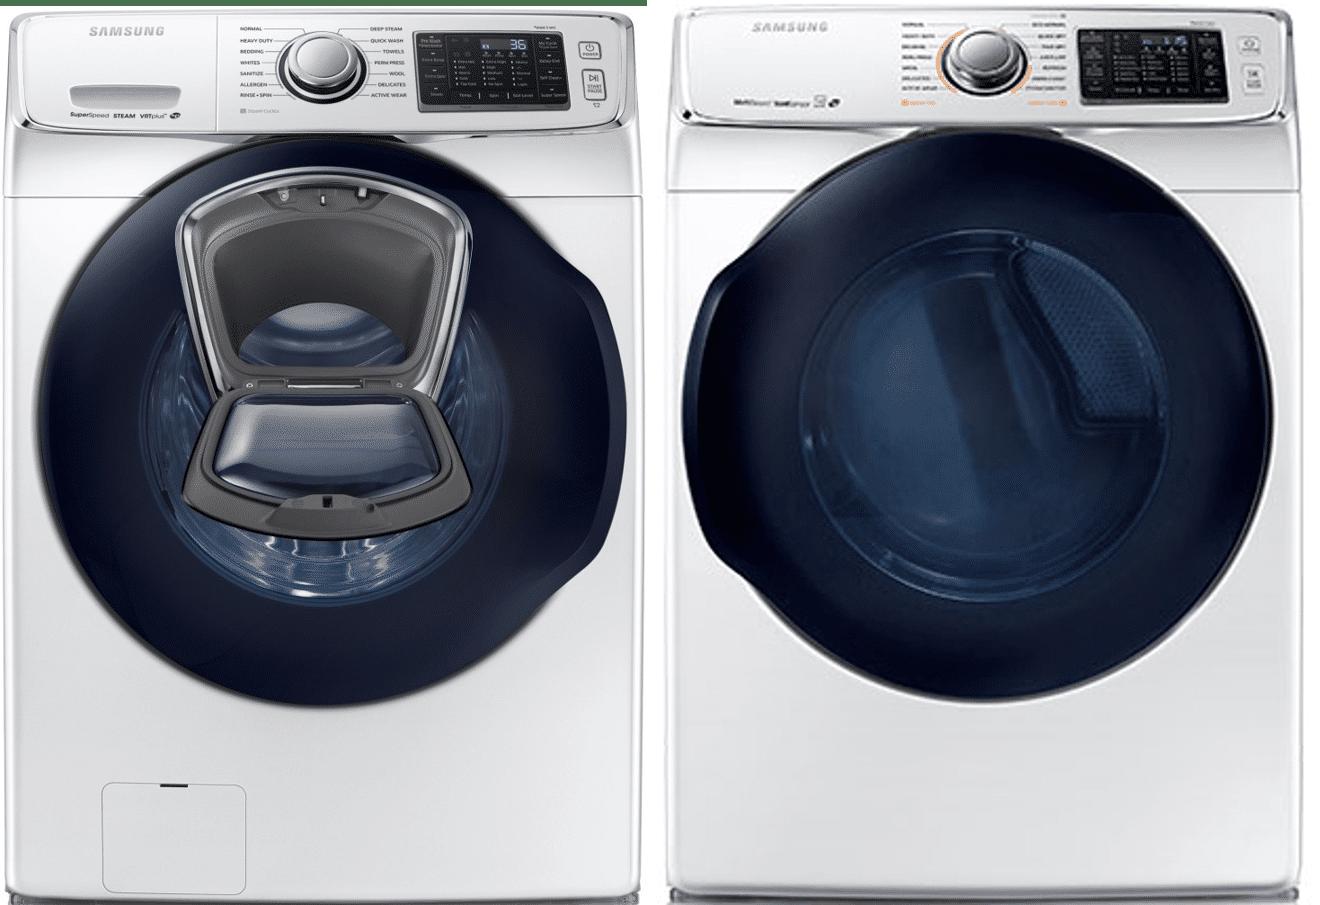 samsung-6500-laundry-set.png